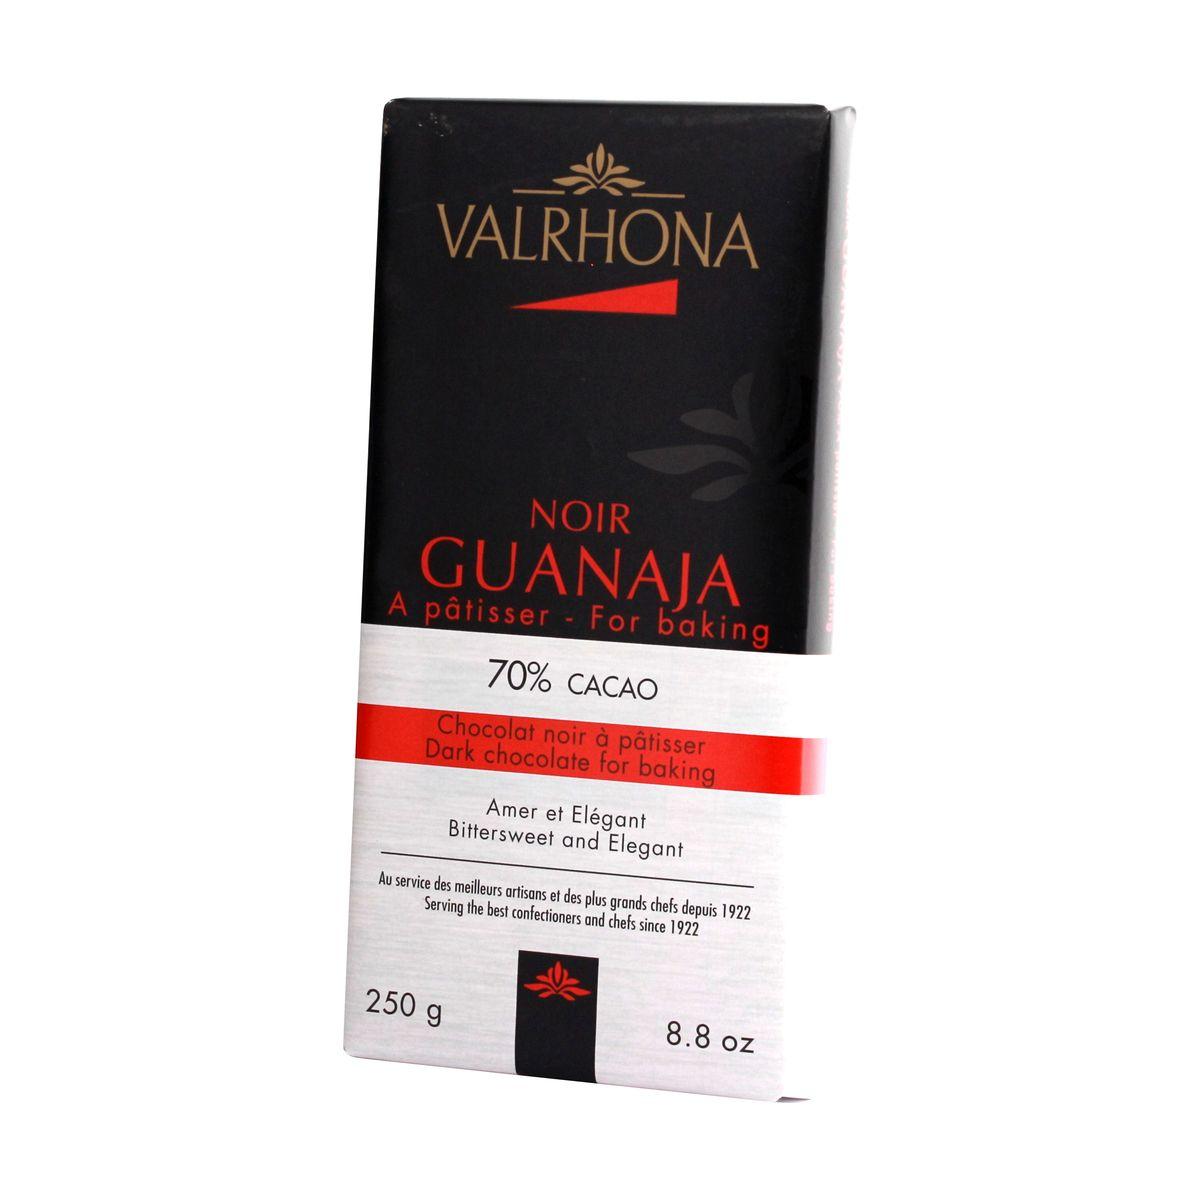 Mini-blocs chocolat à pâtisser noir Guanaja 70% 250gr - Valrhona